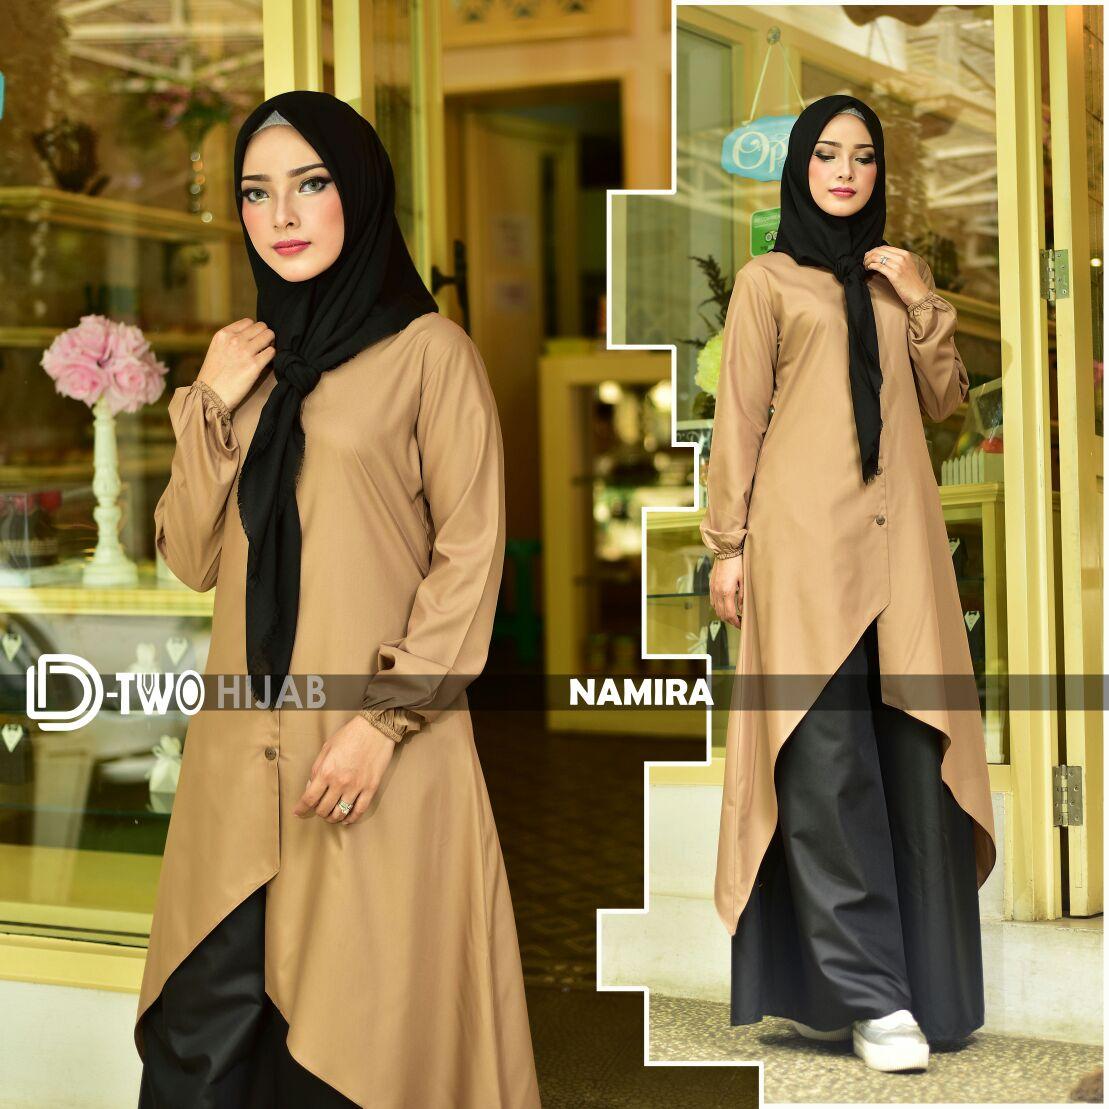 baju gamis namira by hijab d-two choco